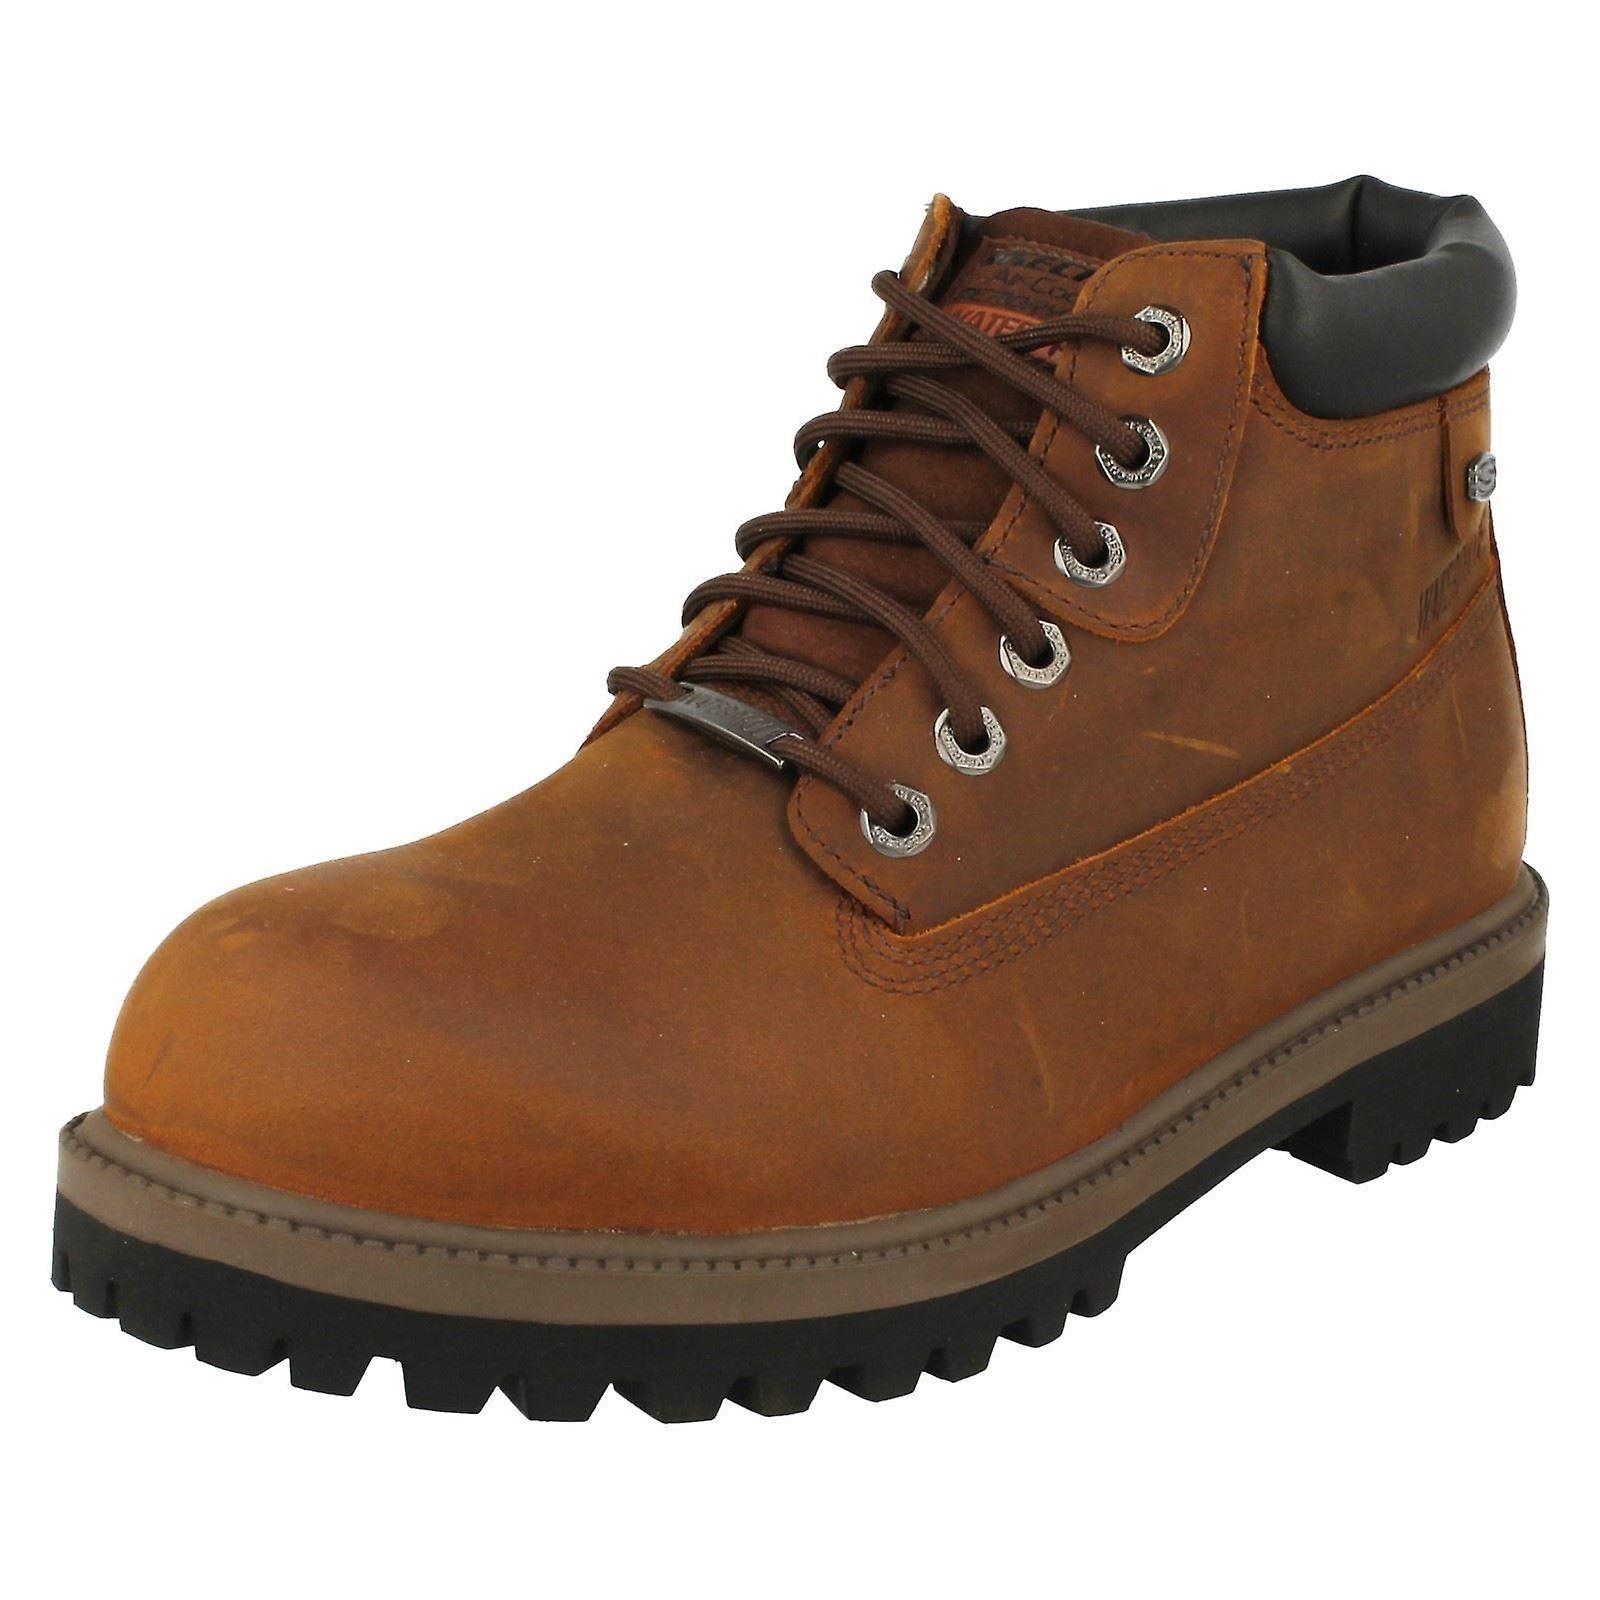 Mens Sketchers Casual Waterproof Lace Up Boots Verdict